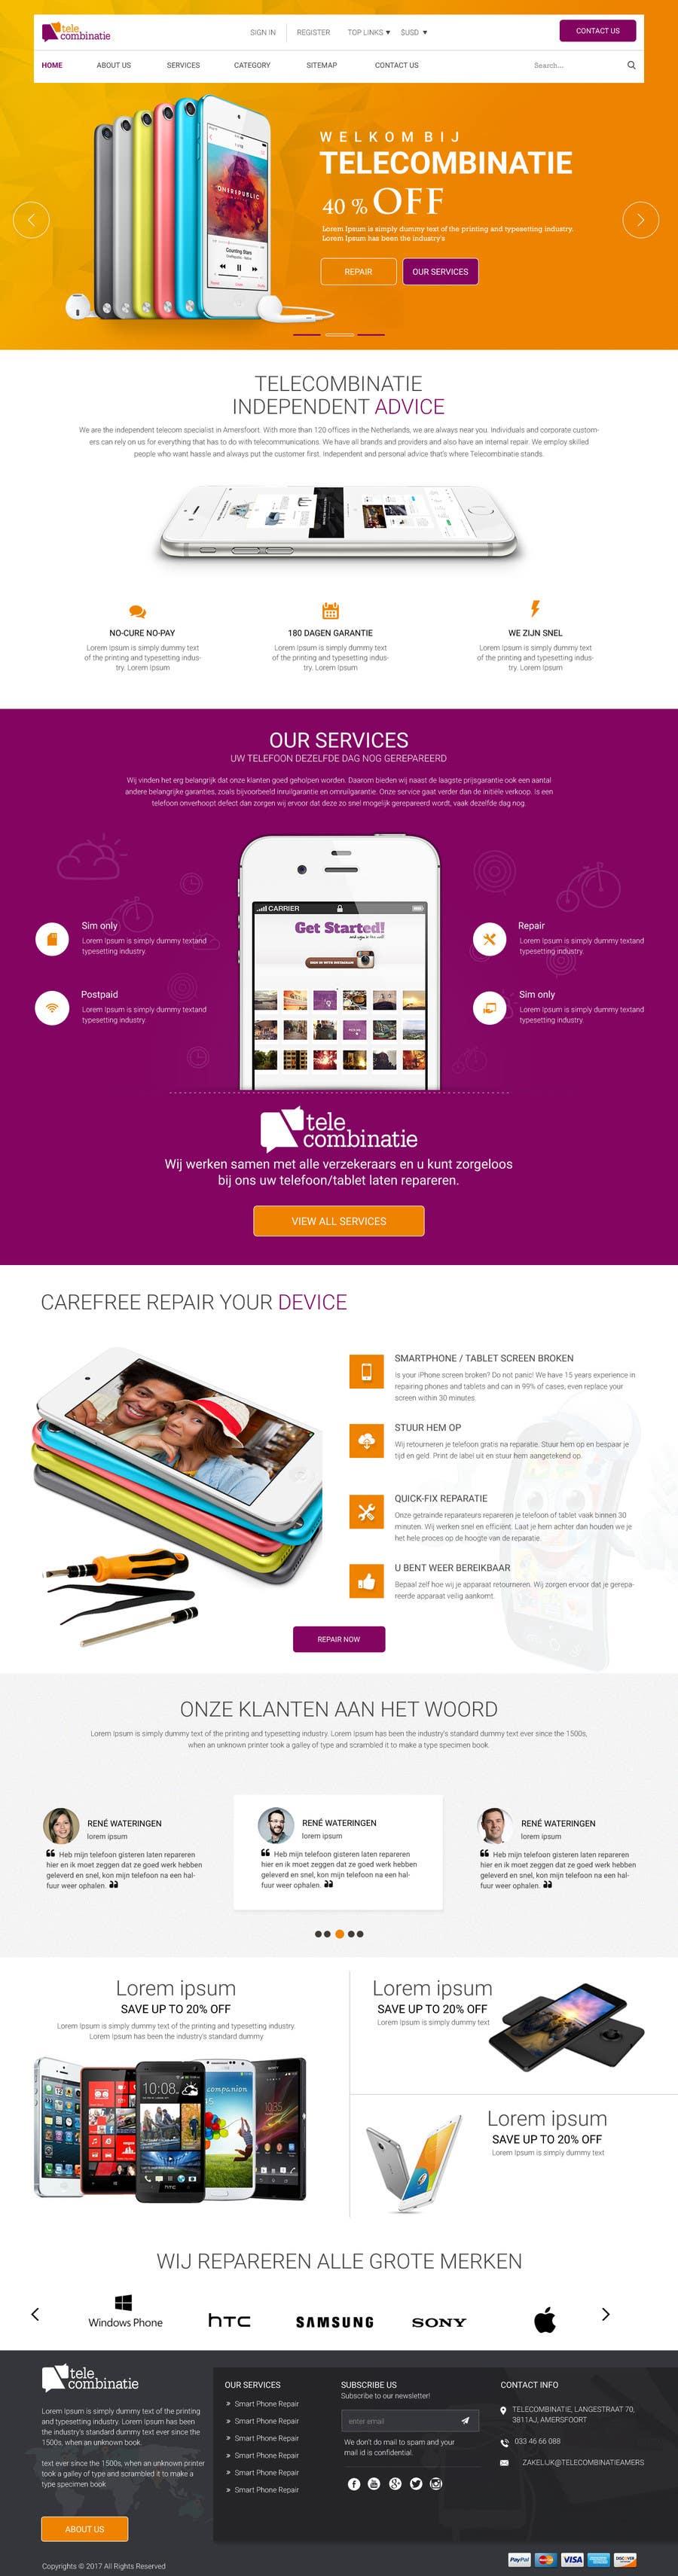 Proposition n°5 du concours Design a Website Mockup, mobile phone shop, repair and more